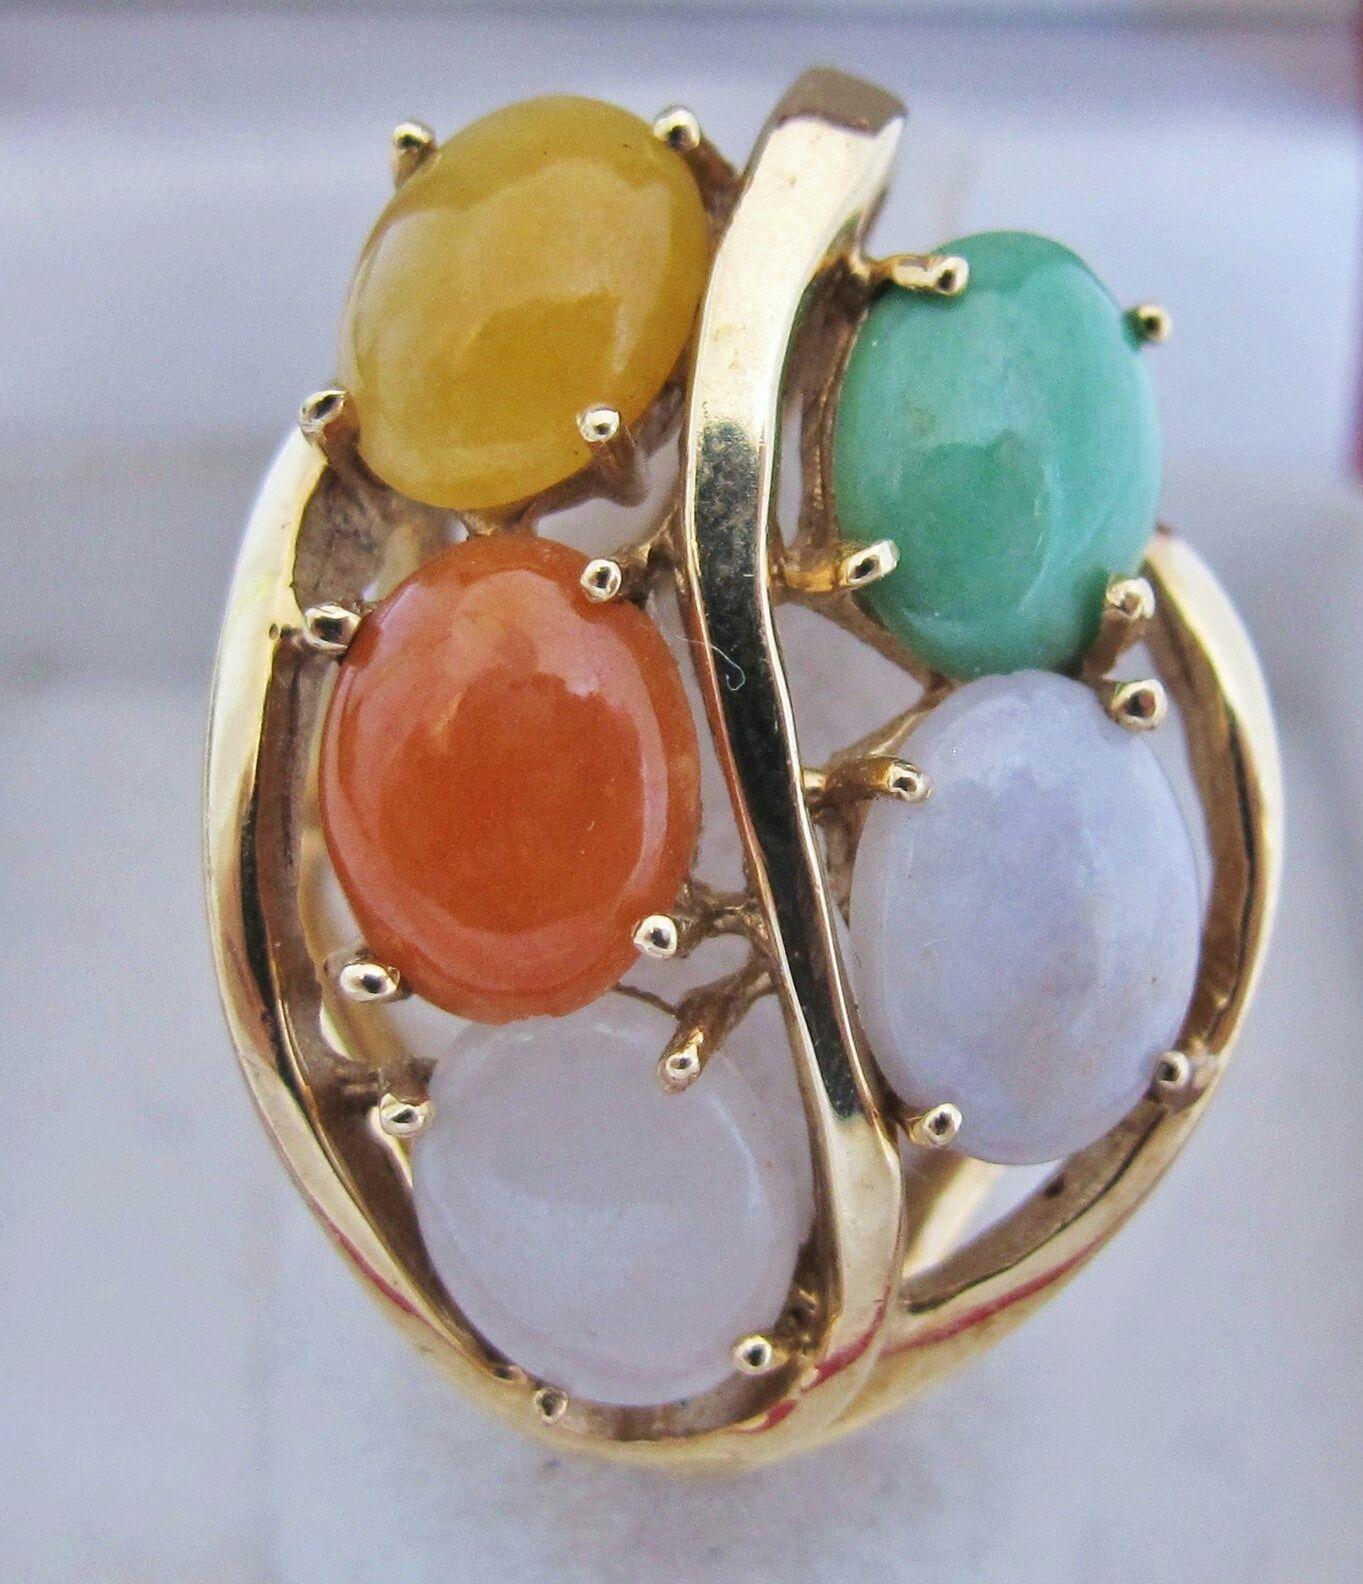 Big 14K Yellow gold & Multicolord JADEITE Jade Ladies Ring (11.3 grams, size 6)